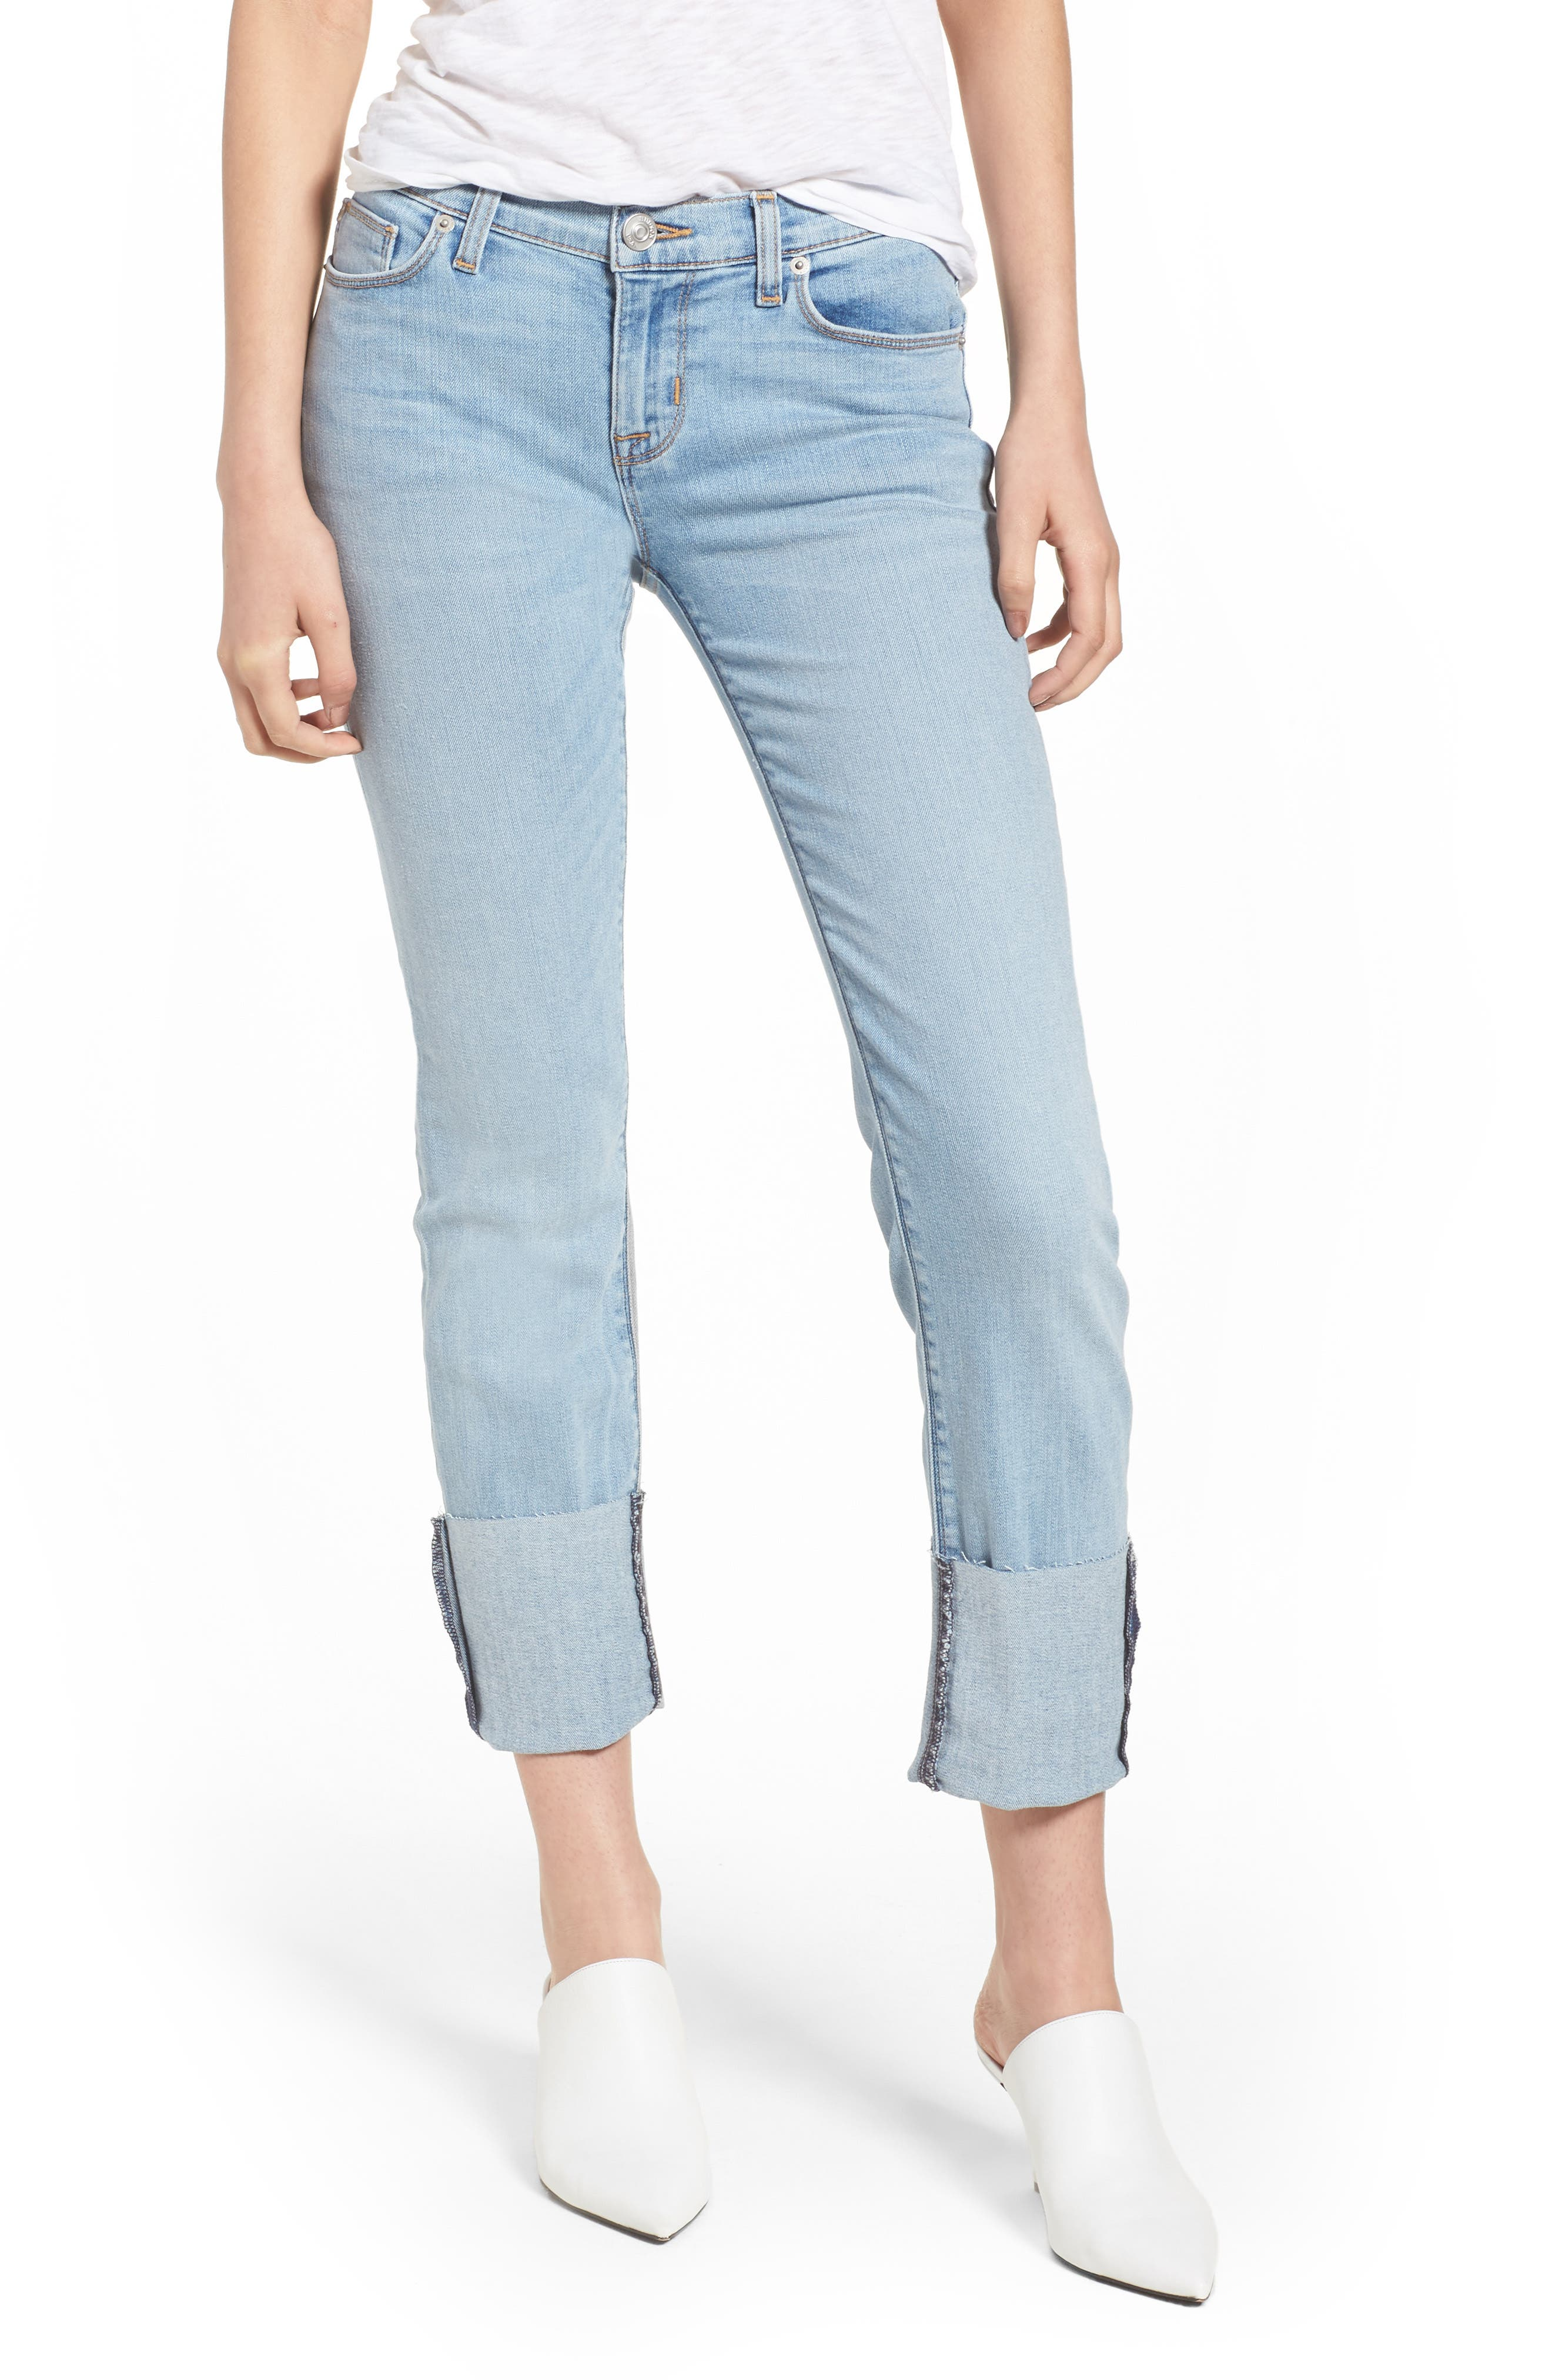 Tally Cuffed Crop Skinny Jeans,                         Main,                         color, Gemini